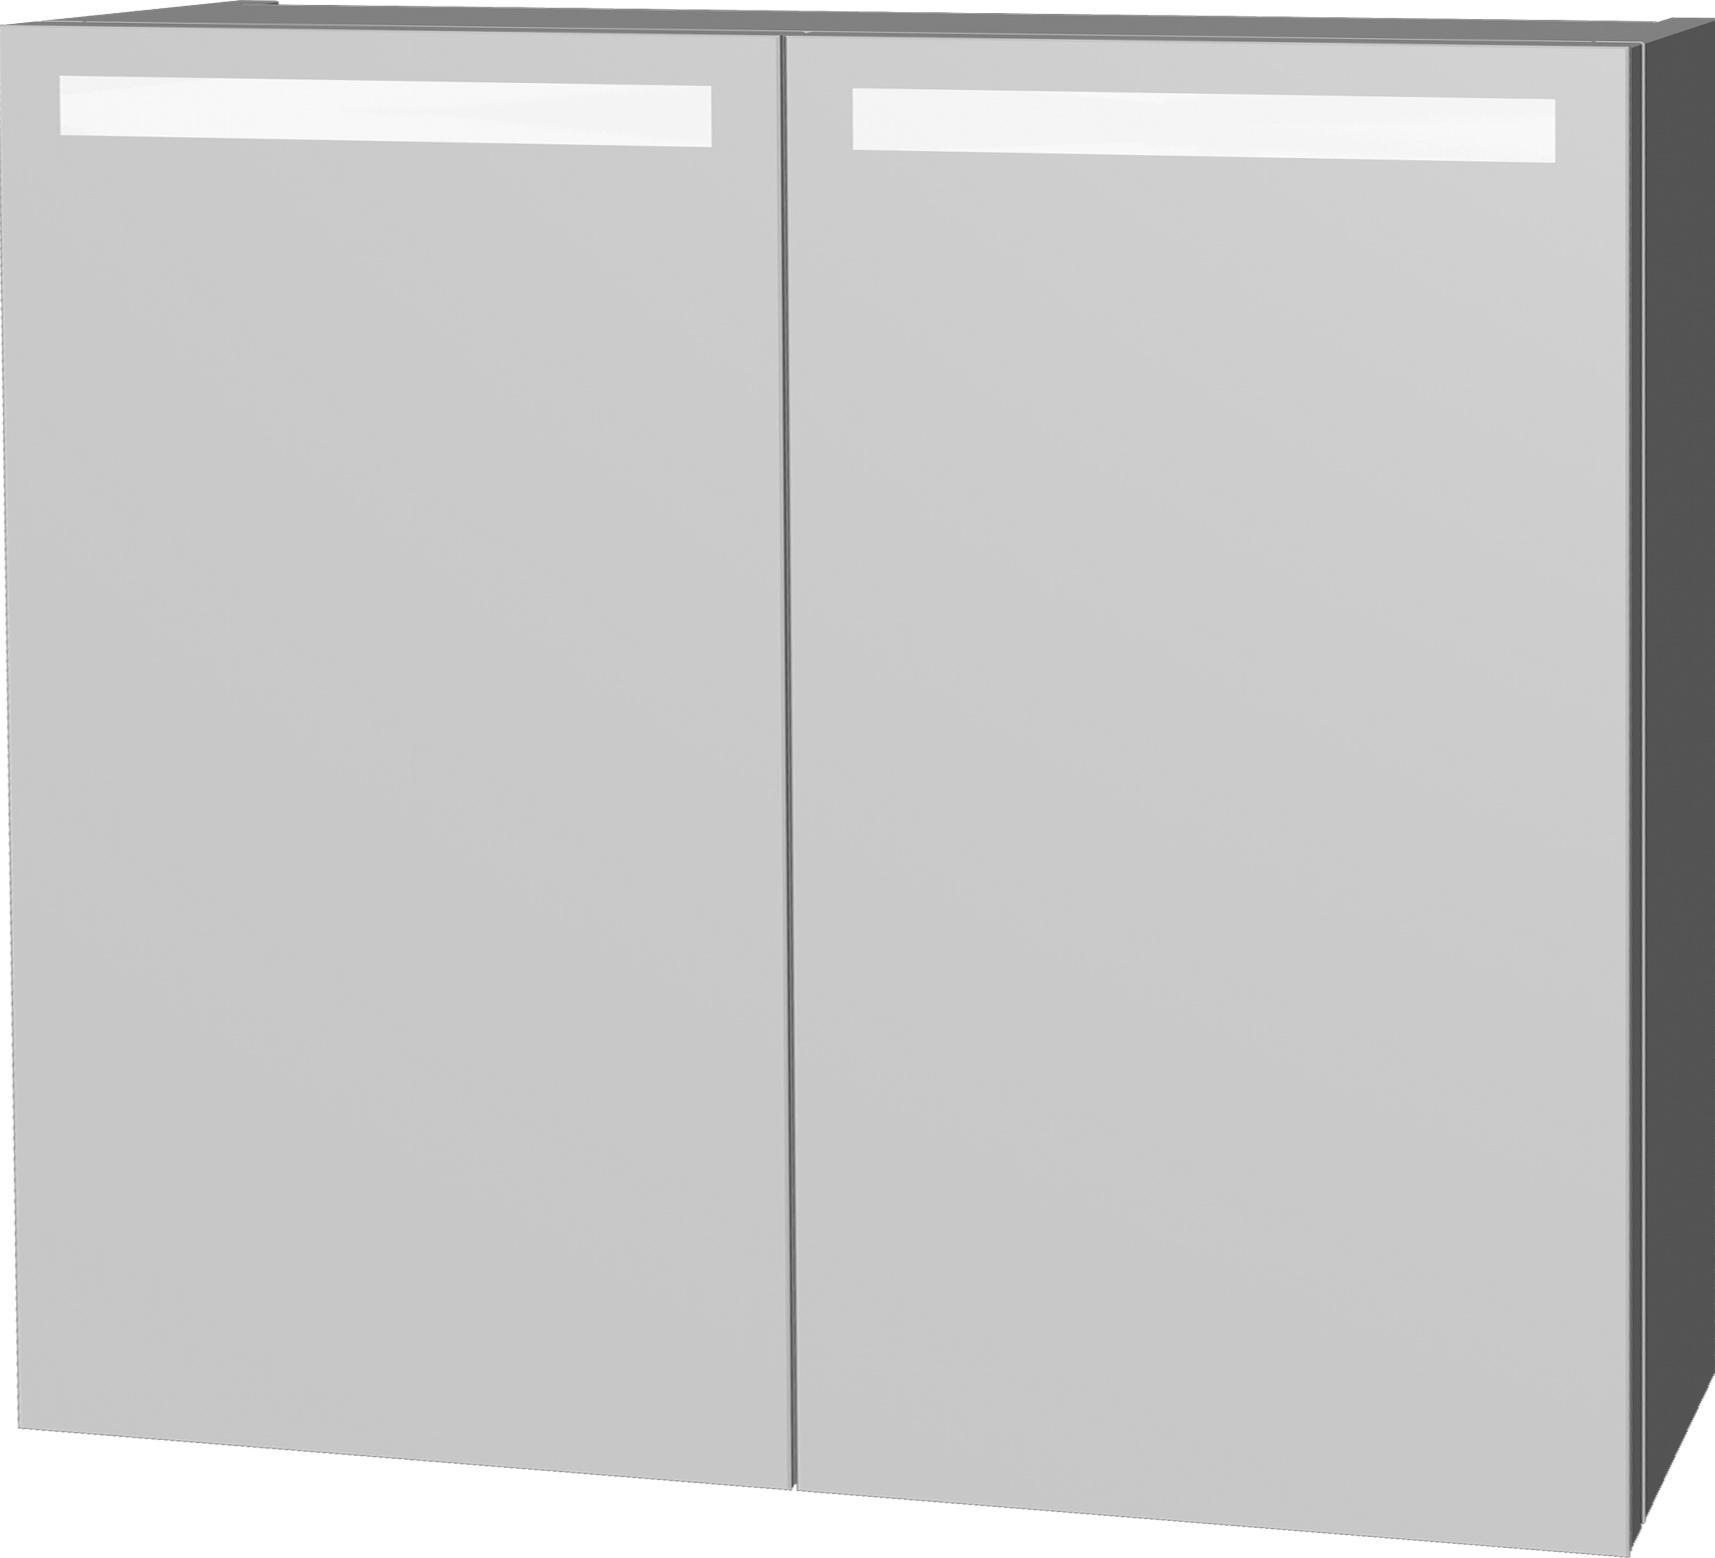 Intedoor Zrcadlová skříňka 80x72 cm, s osvětlením DZS80